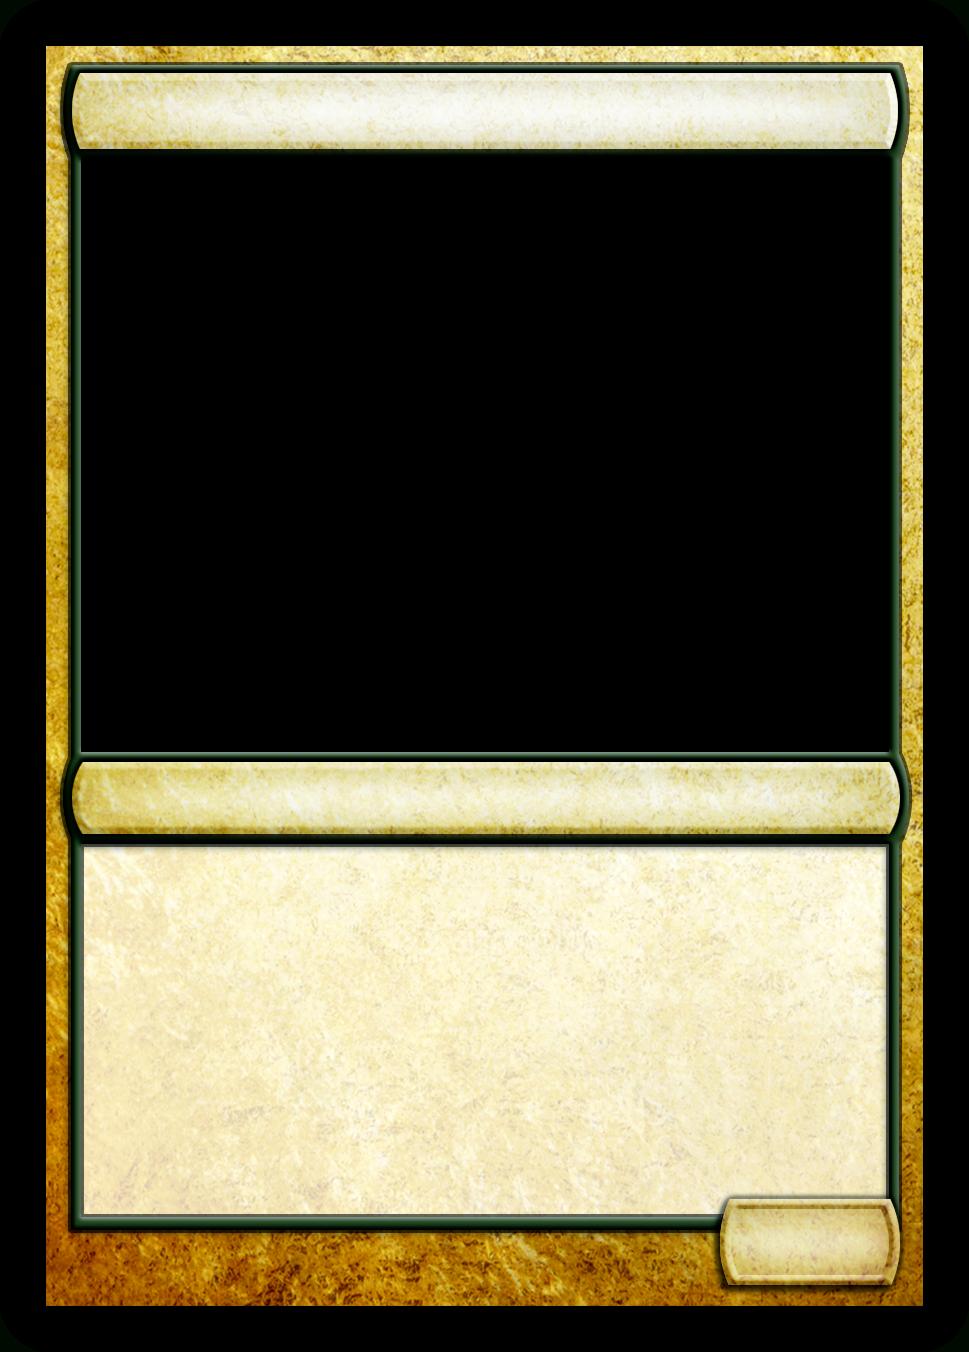 Mtg Multicolor Creature Template  Mtg Templates  Magic The In Magic The Gathering Card Template